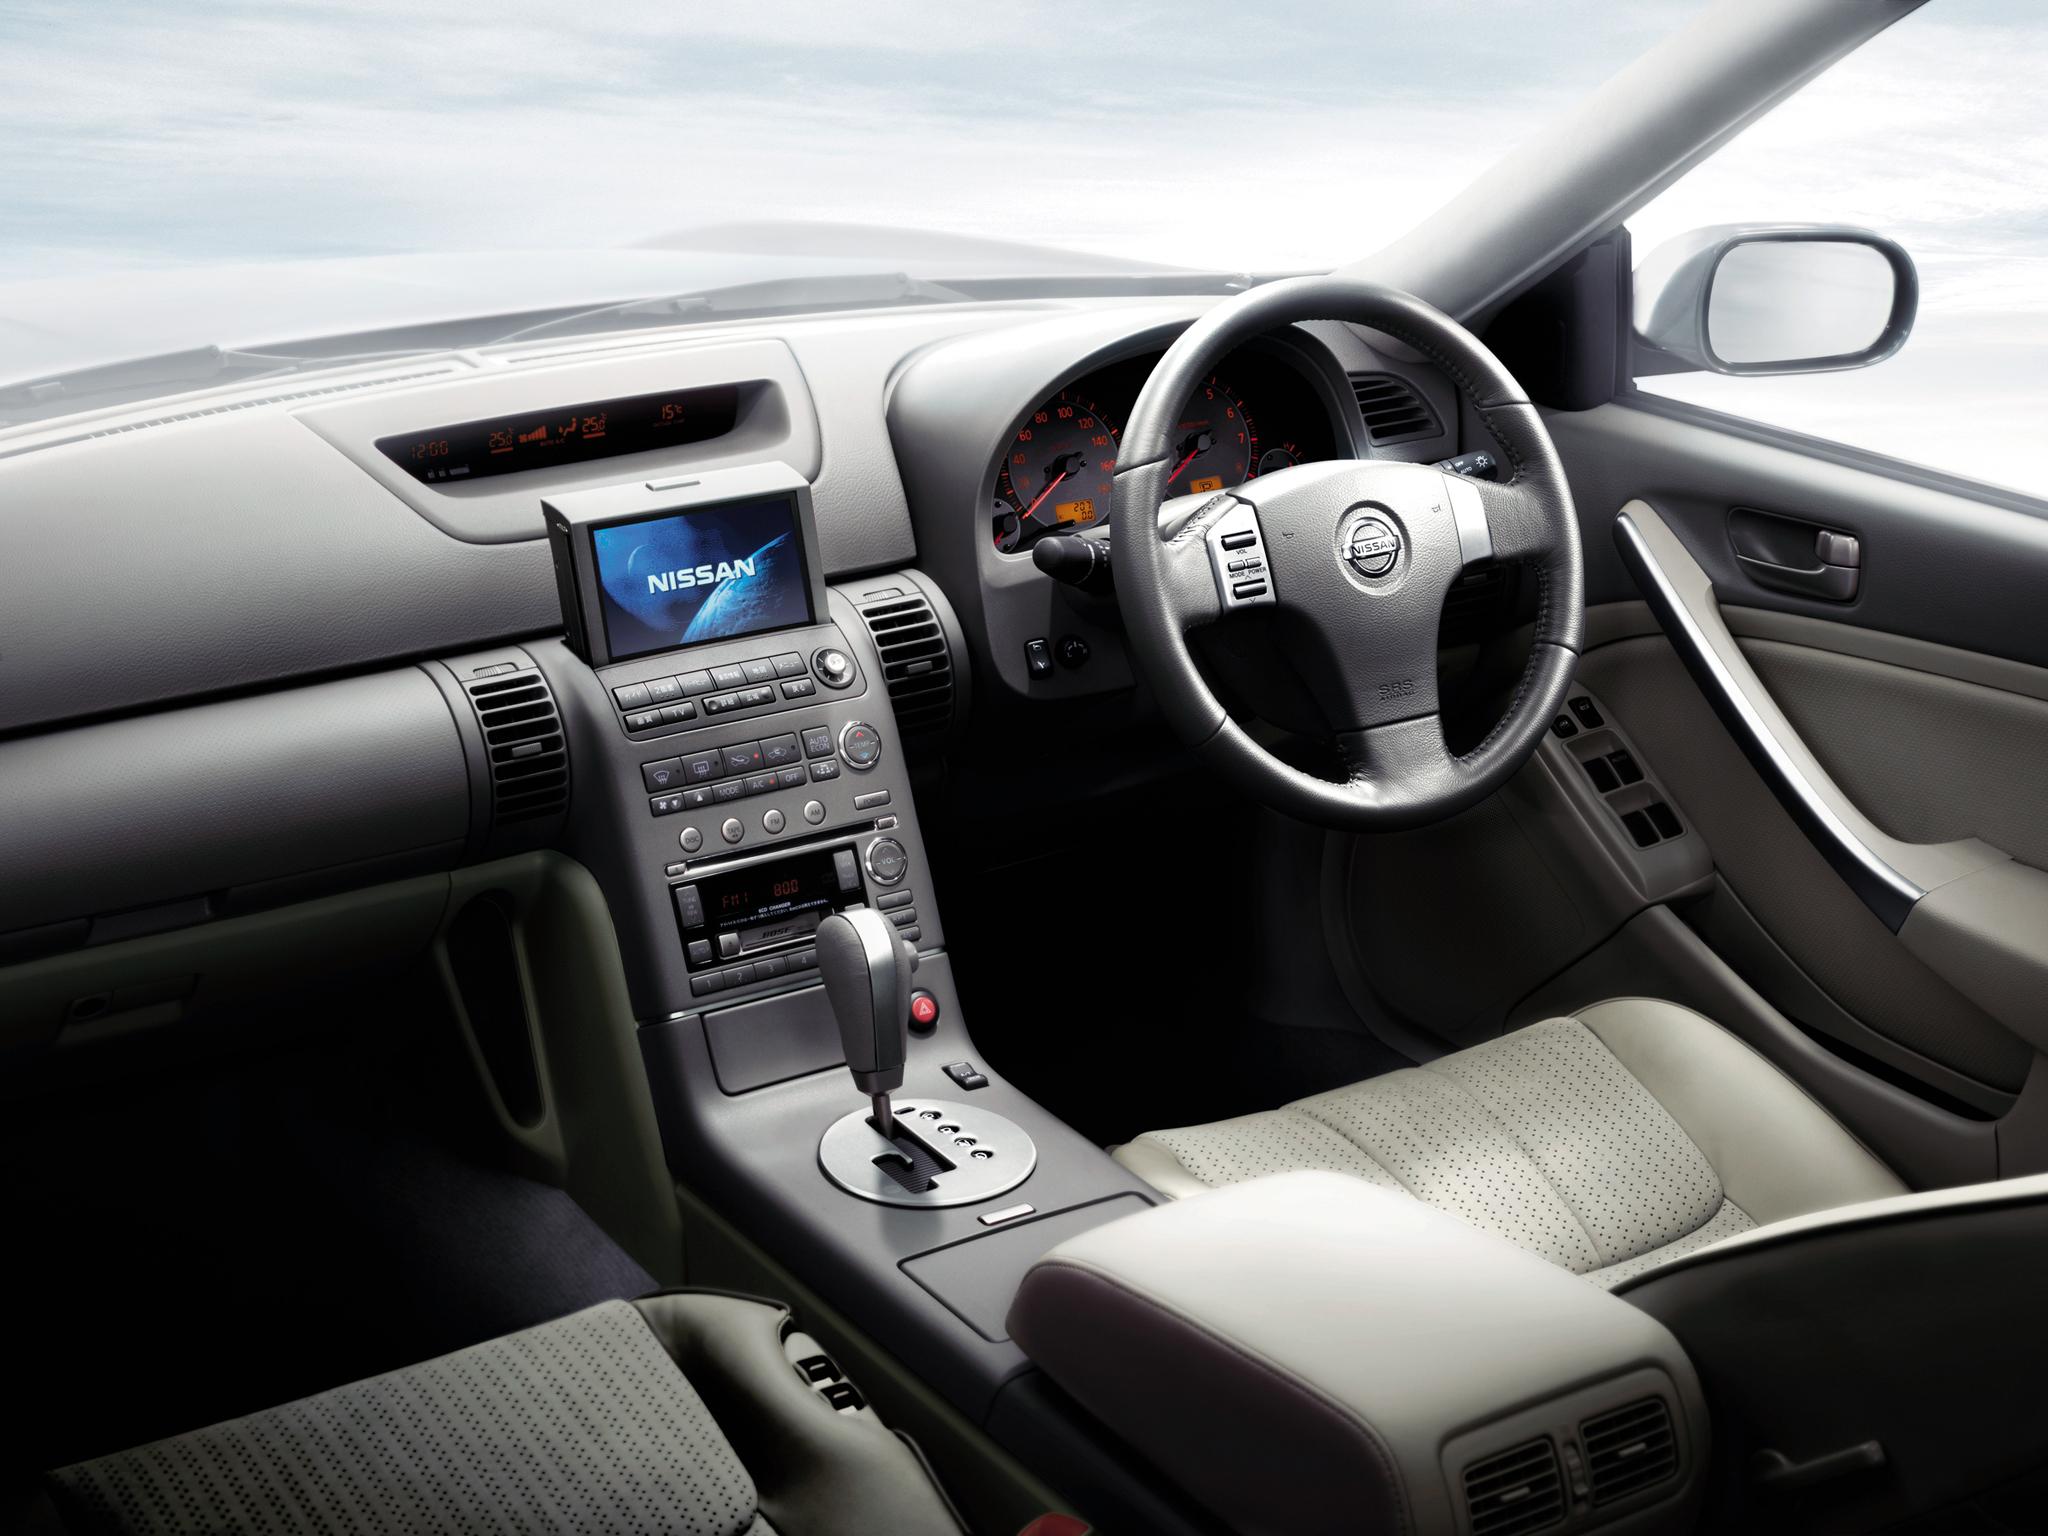 Nissan (Ниссан) Skyline V35 2001-2004 г.